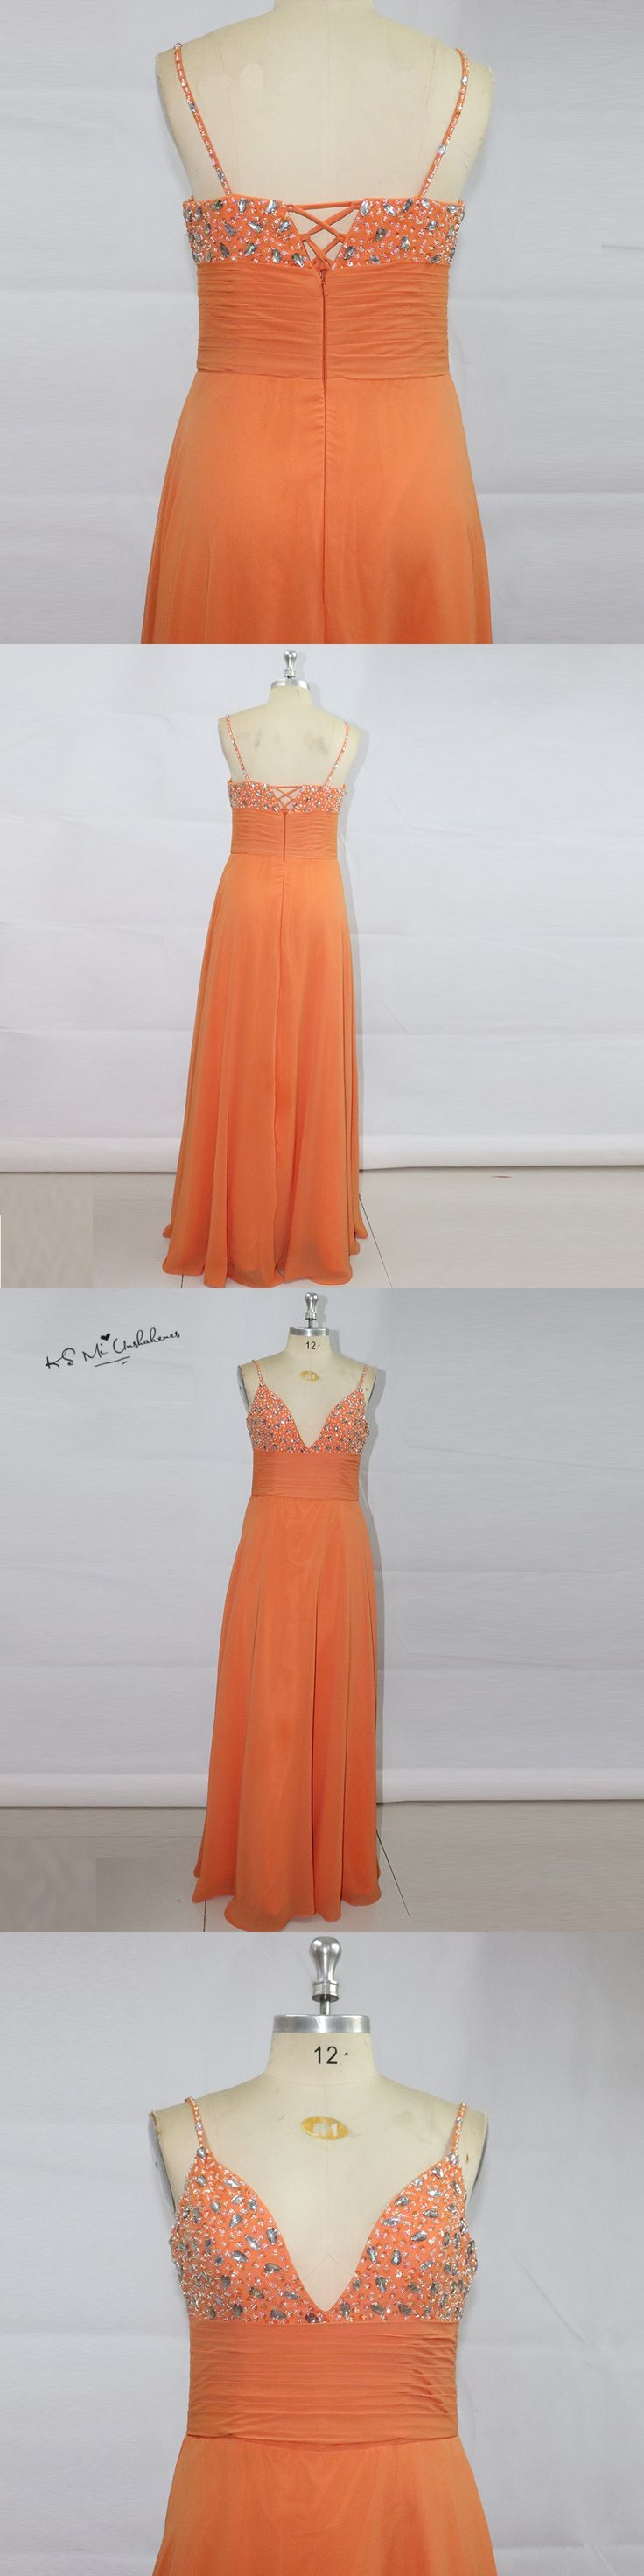 Sexy Orange Long Wedding Guest Dresses 2017 Crystals Bridesmaid Dress Beads Elegant Cheap Prom Dress Vestido de Gala Festa Baile